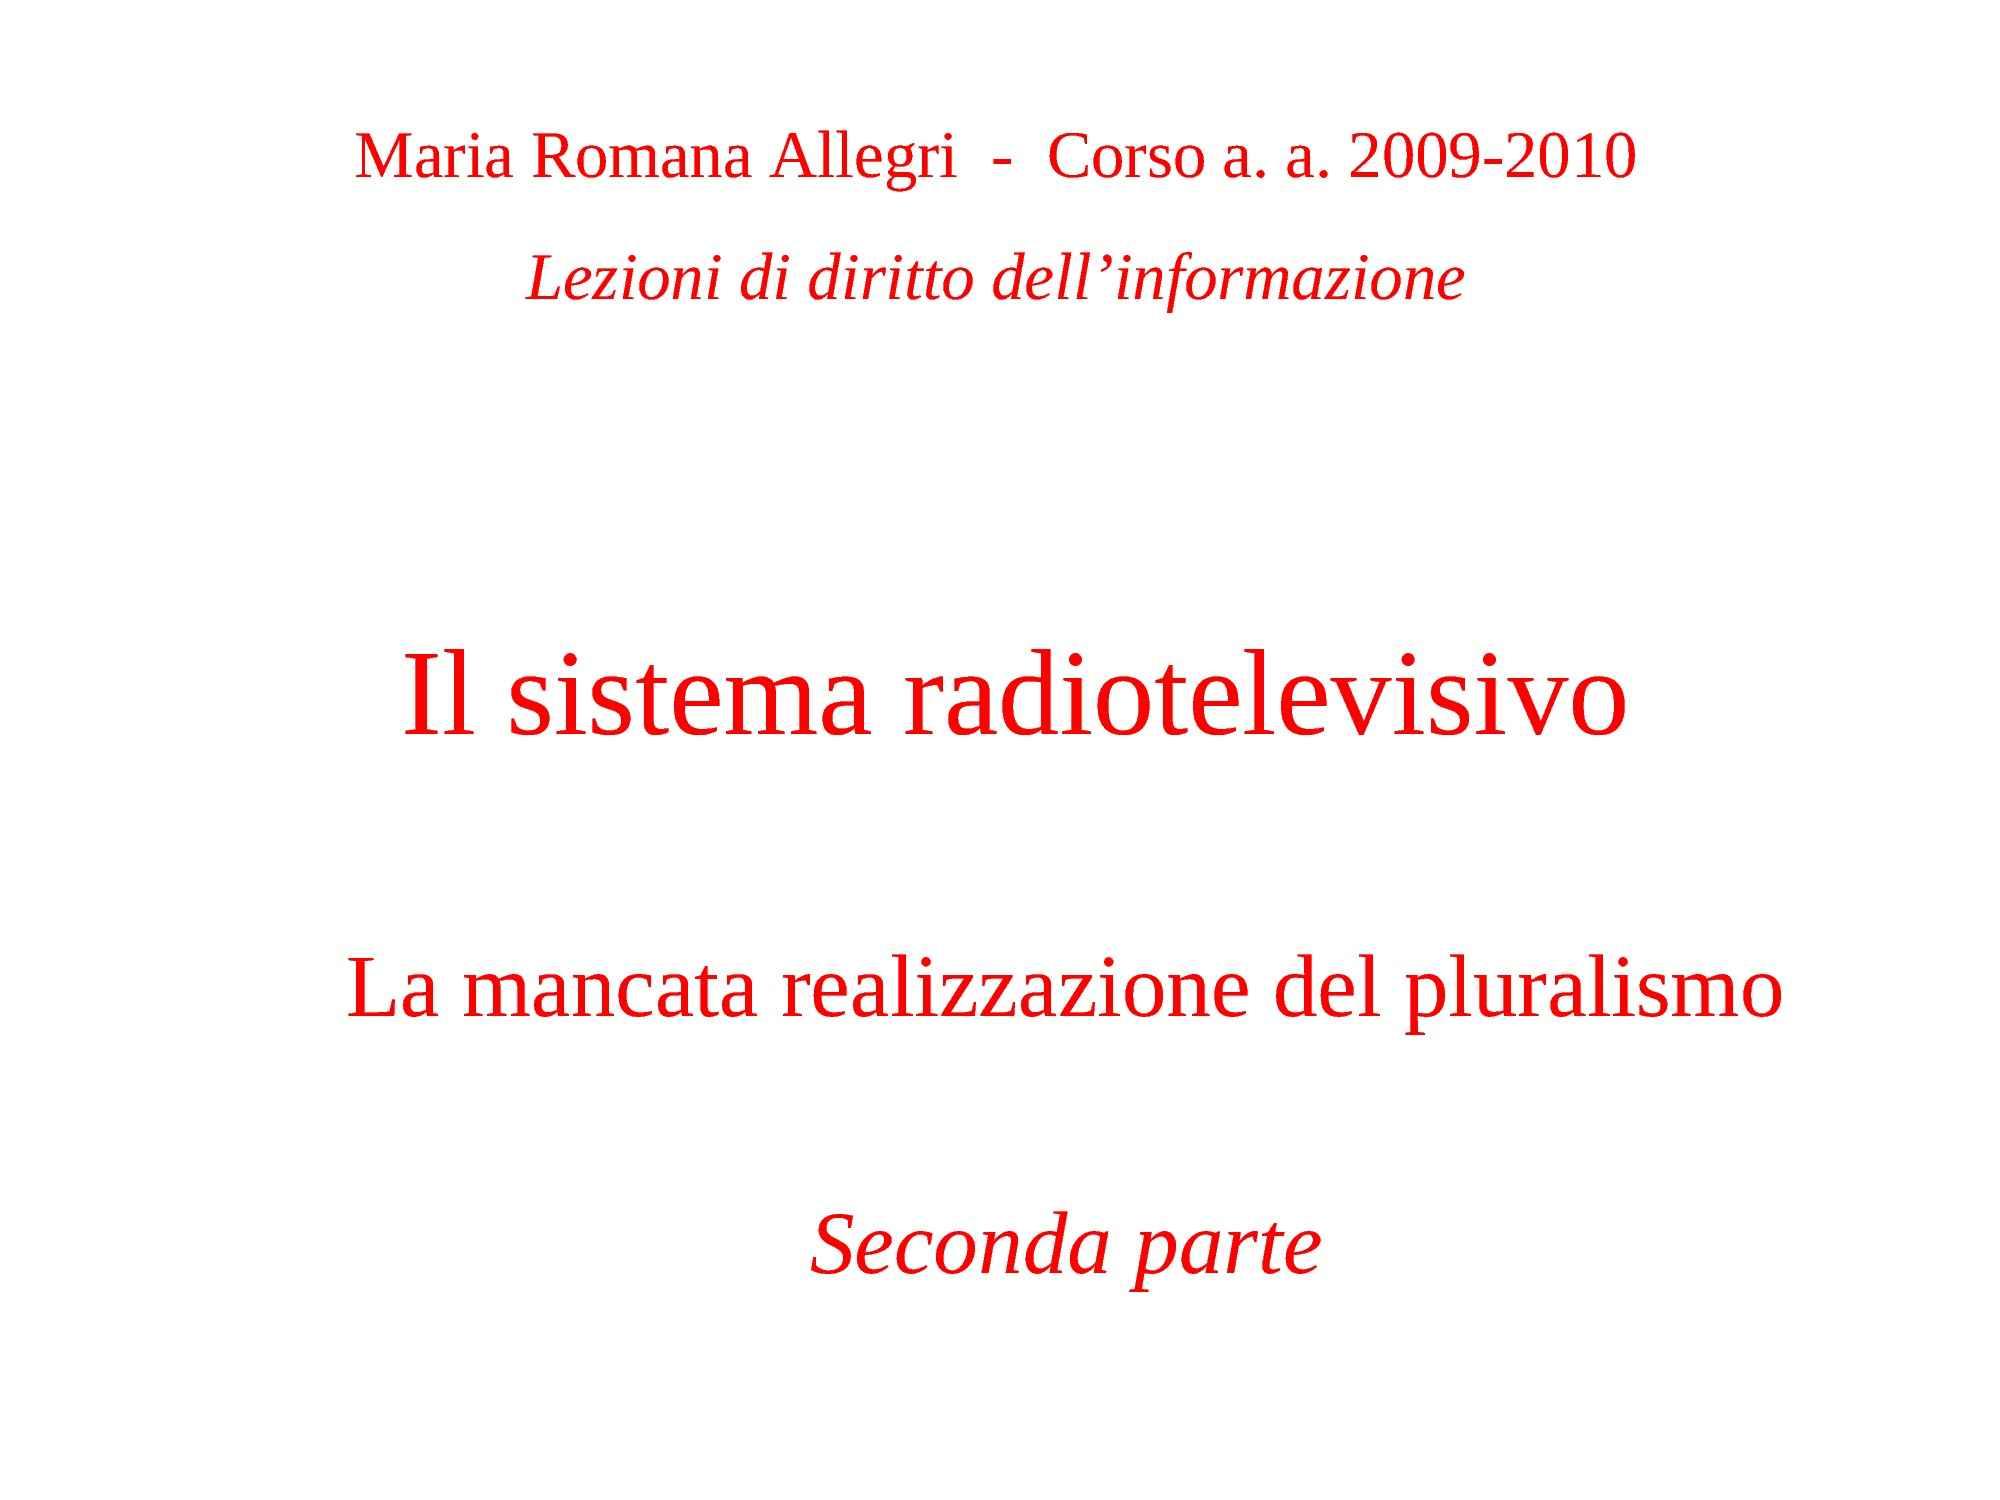 Sitema Radiotelevisivo - Leggi